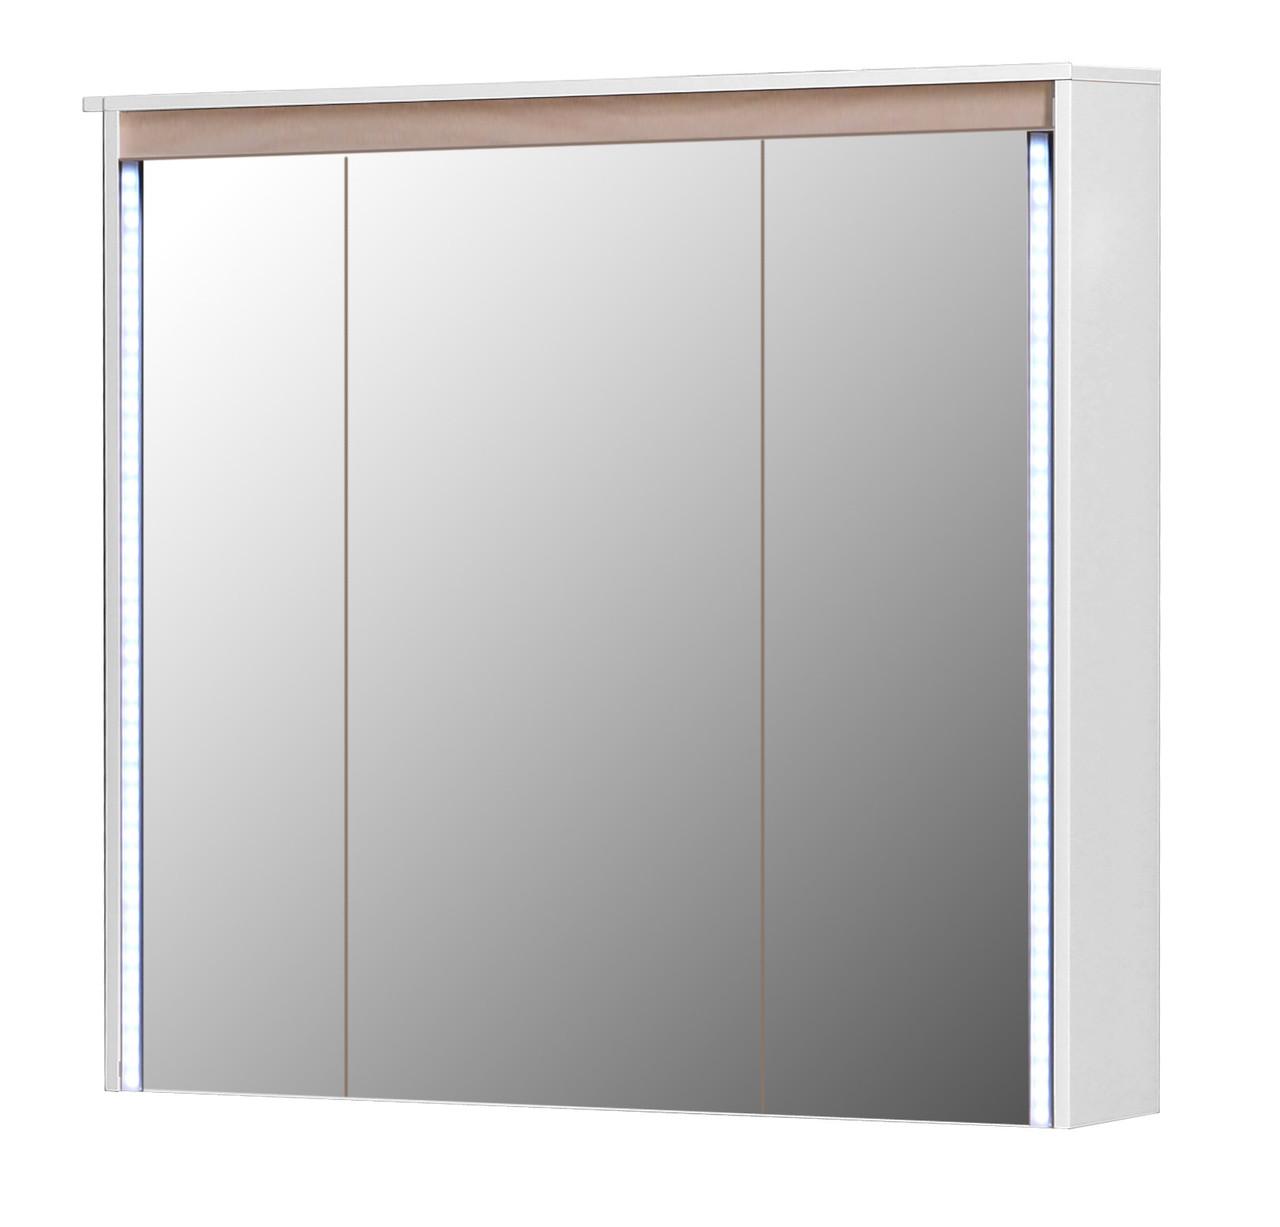 Зеркальный шкаф Мойдодыр Мадрид ЗШ-100 Береза